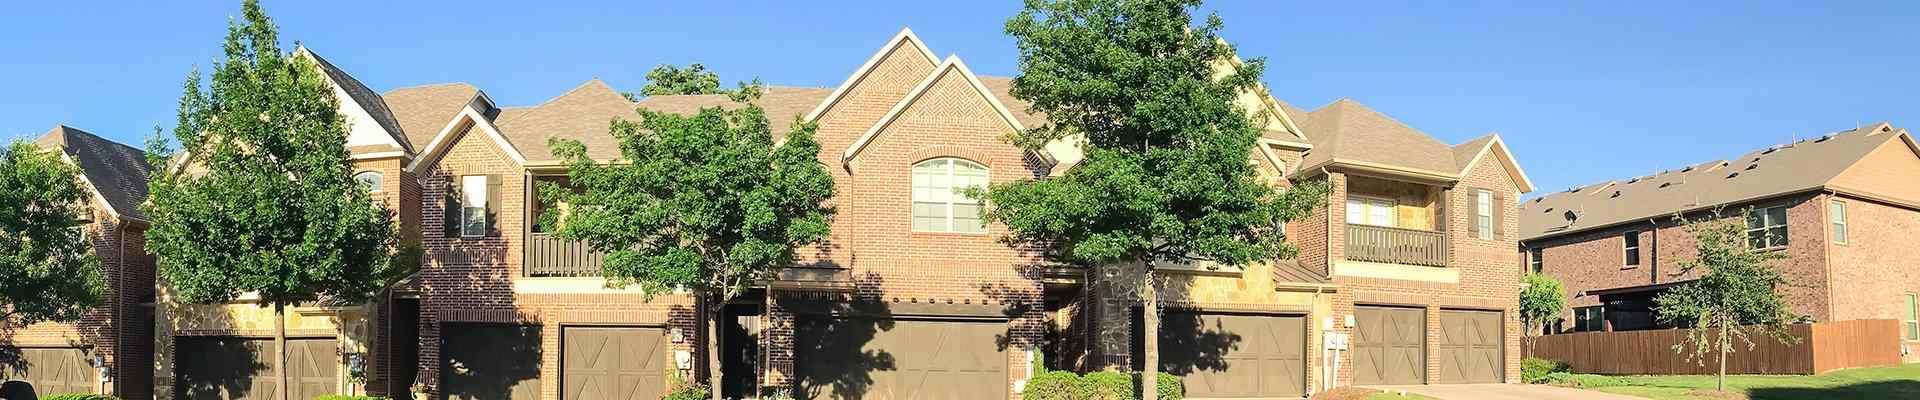 a row of homes in a suburban neighborhood in allen texas